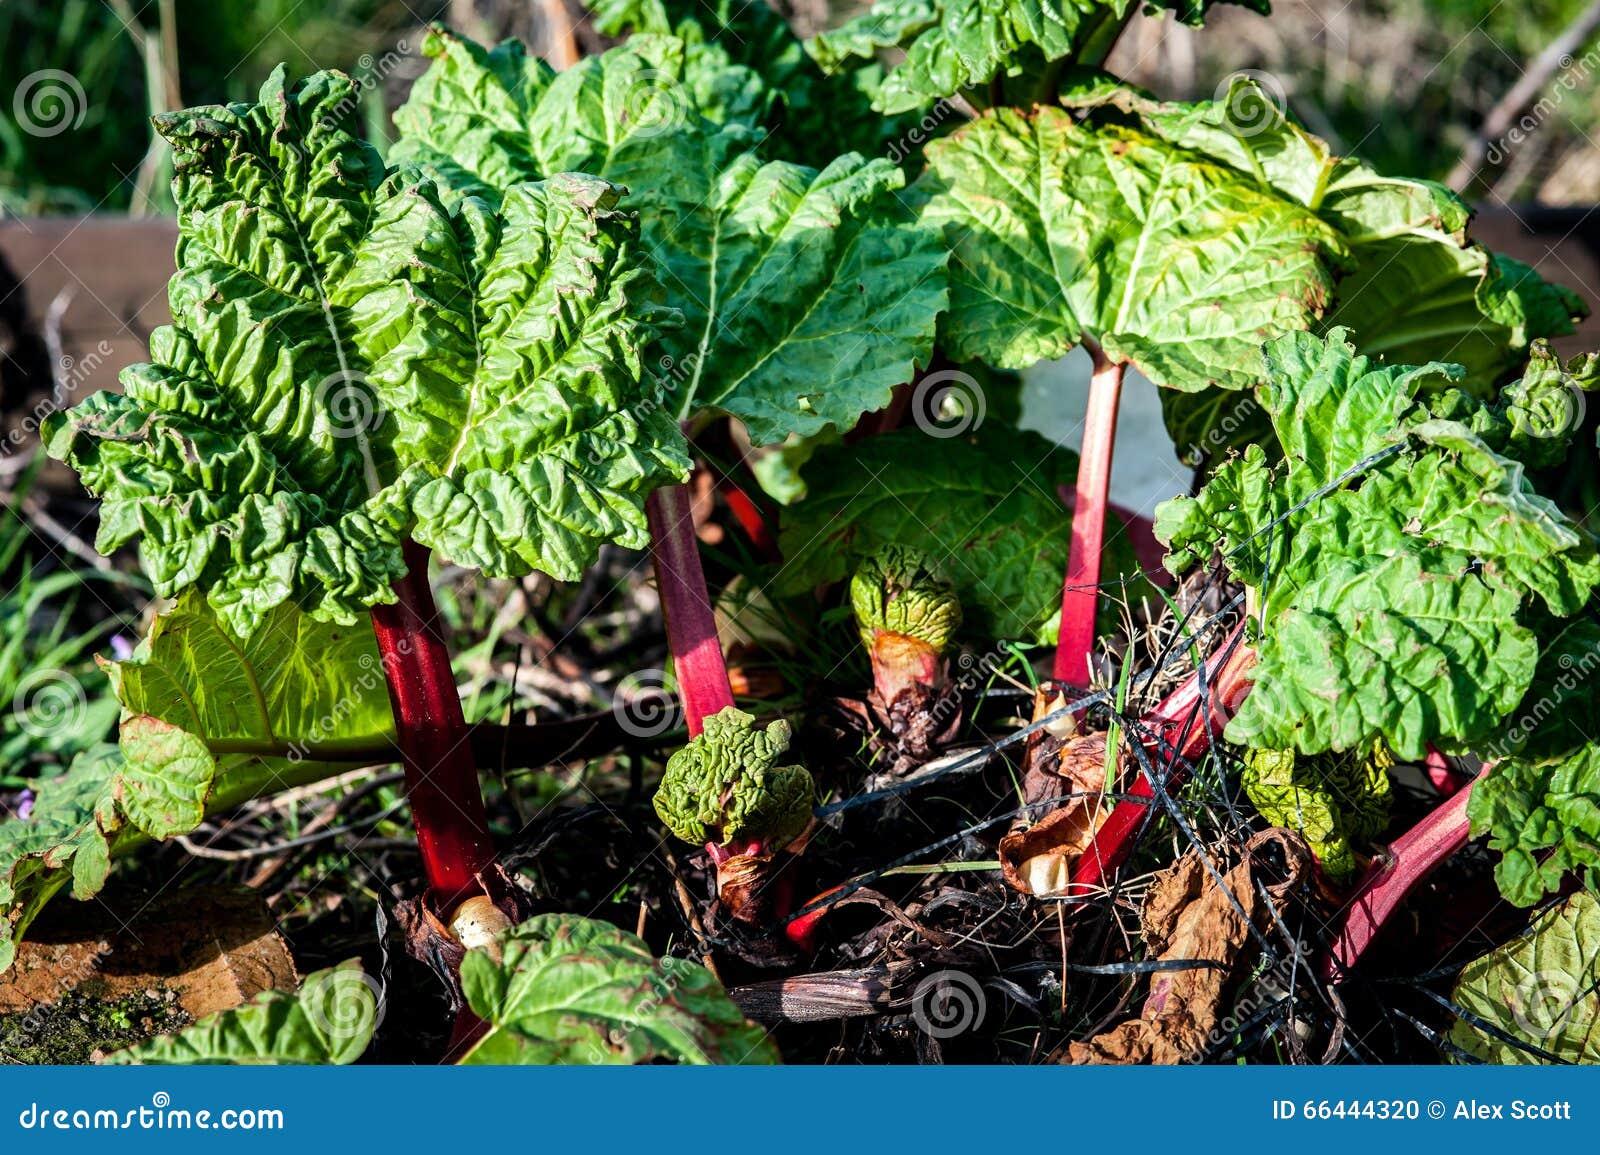 Young rhubarb shoots